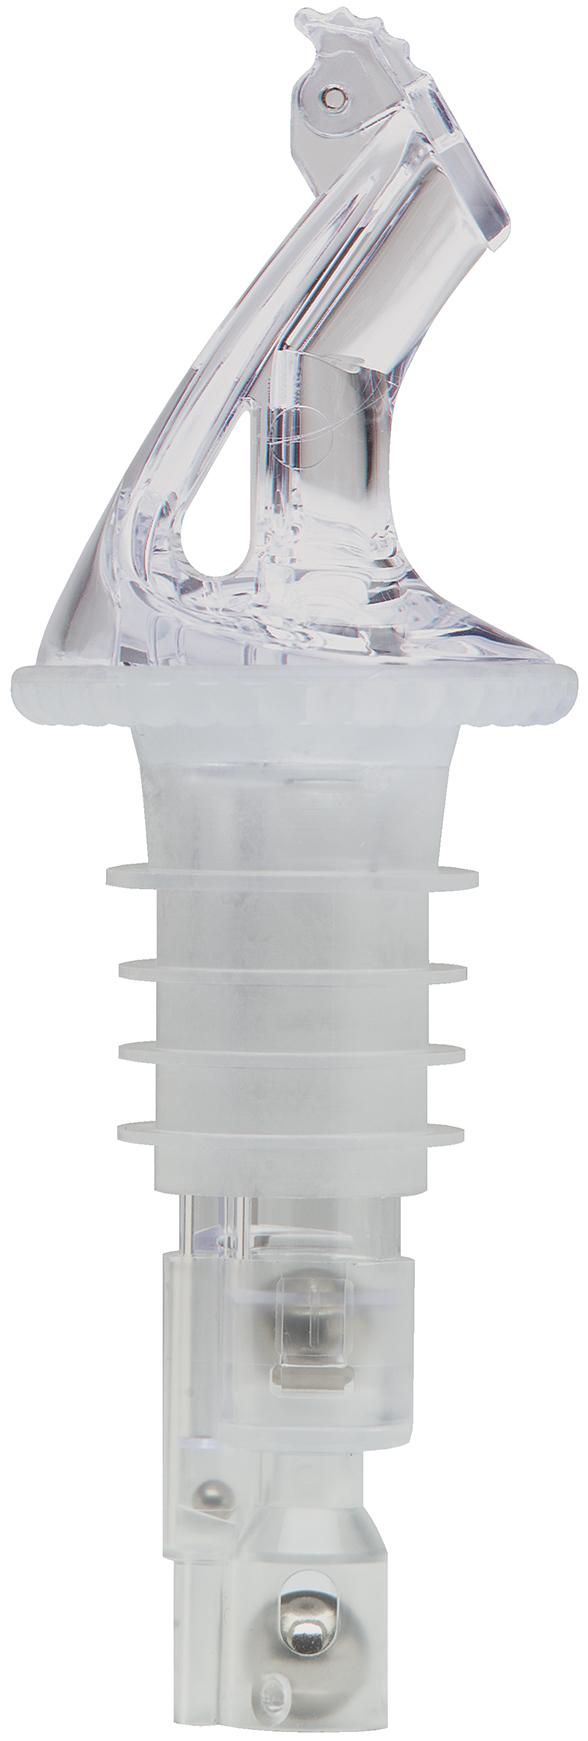 Bar Maid/Glass Pro BMP-4150C liquor pourers